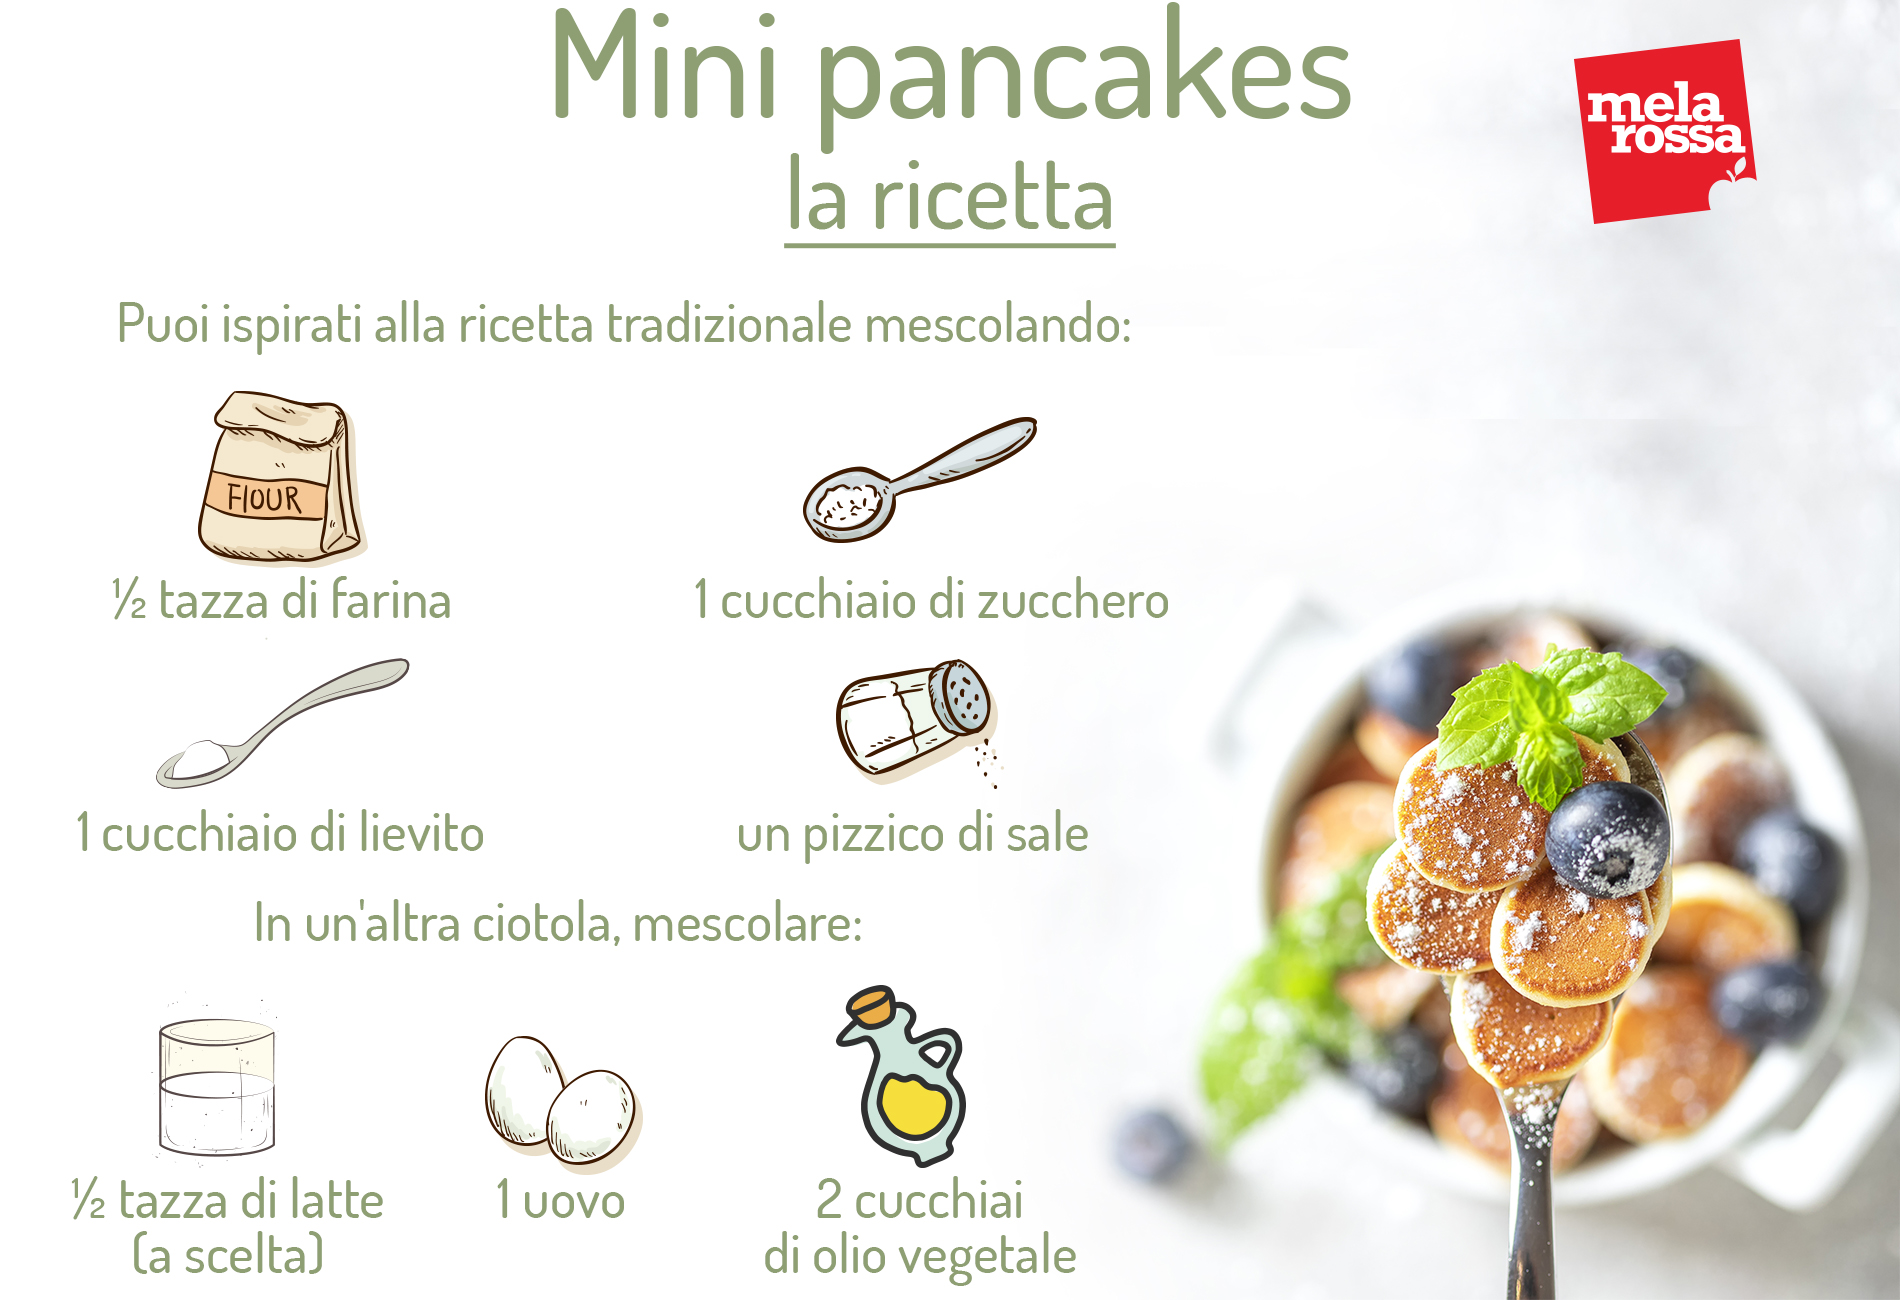 Mini pancakes: la ricetta